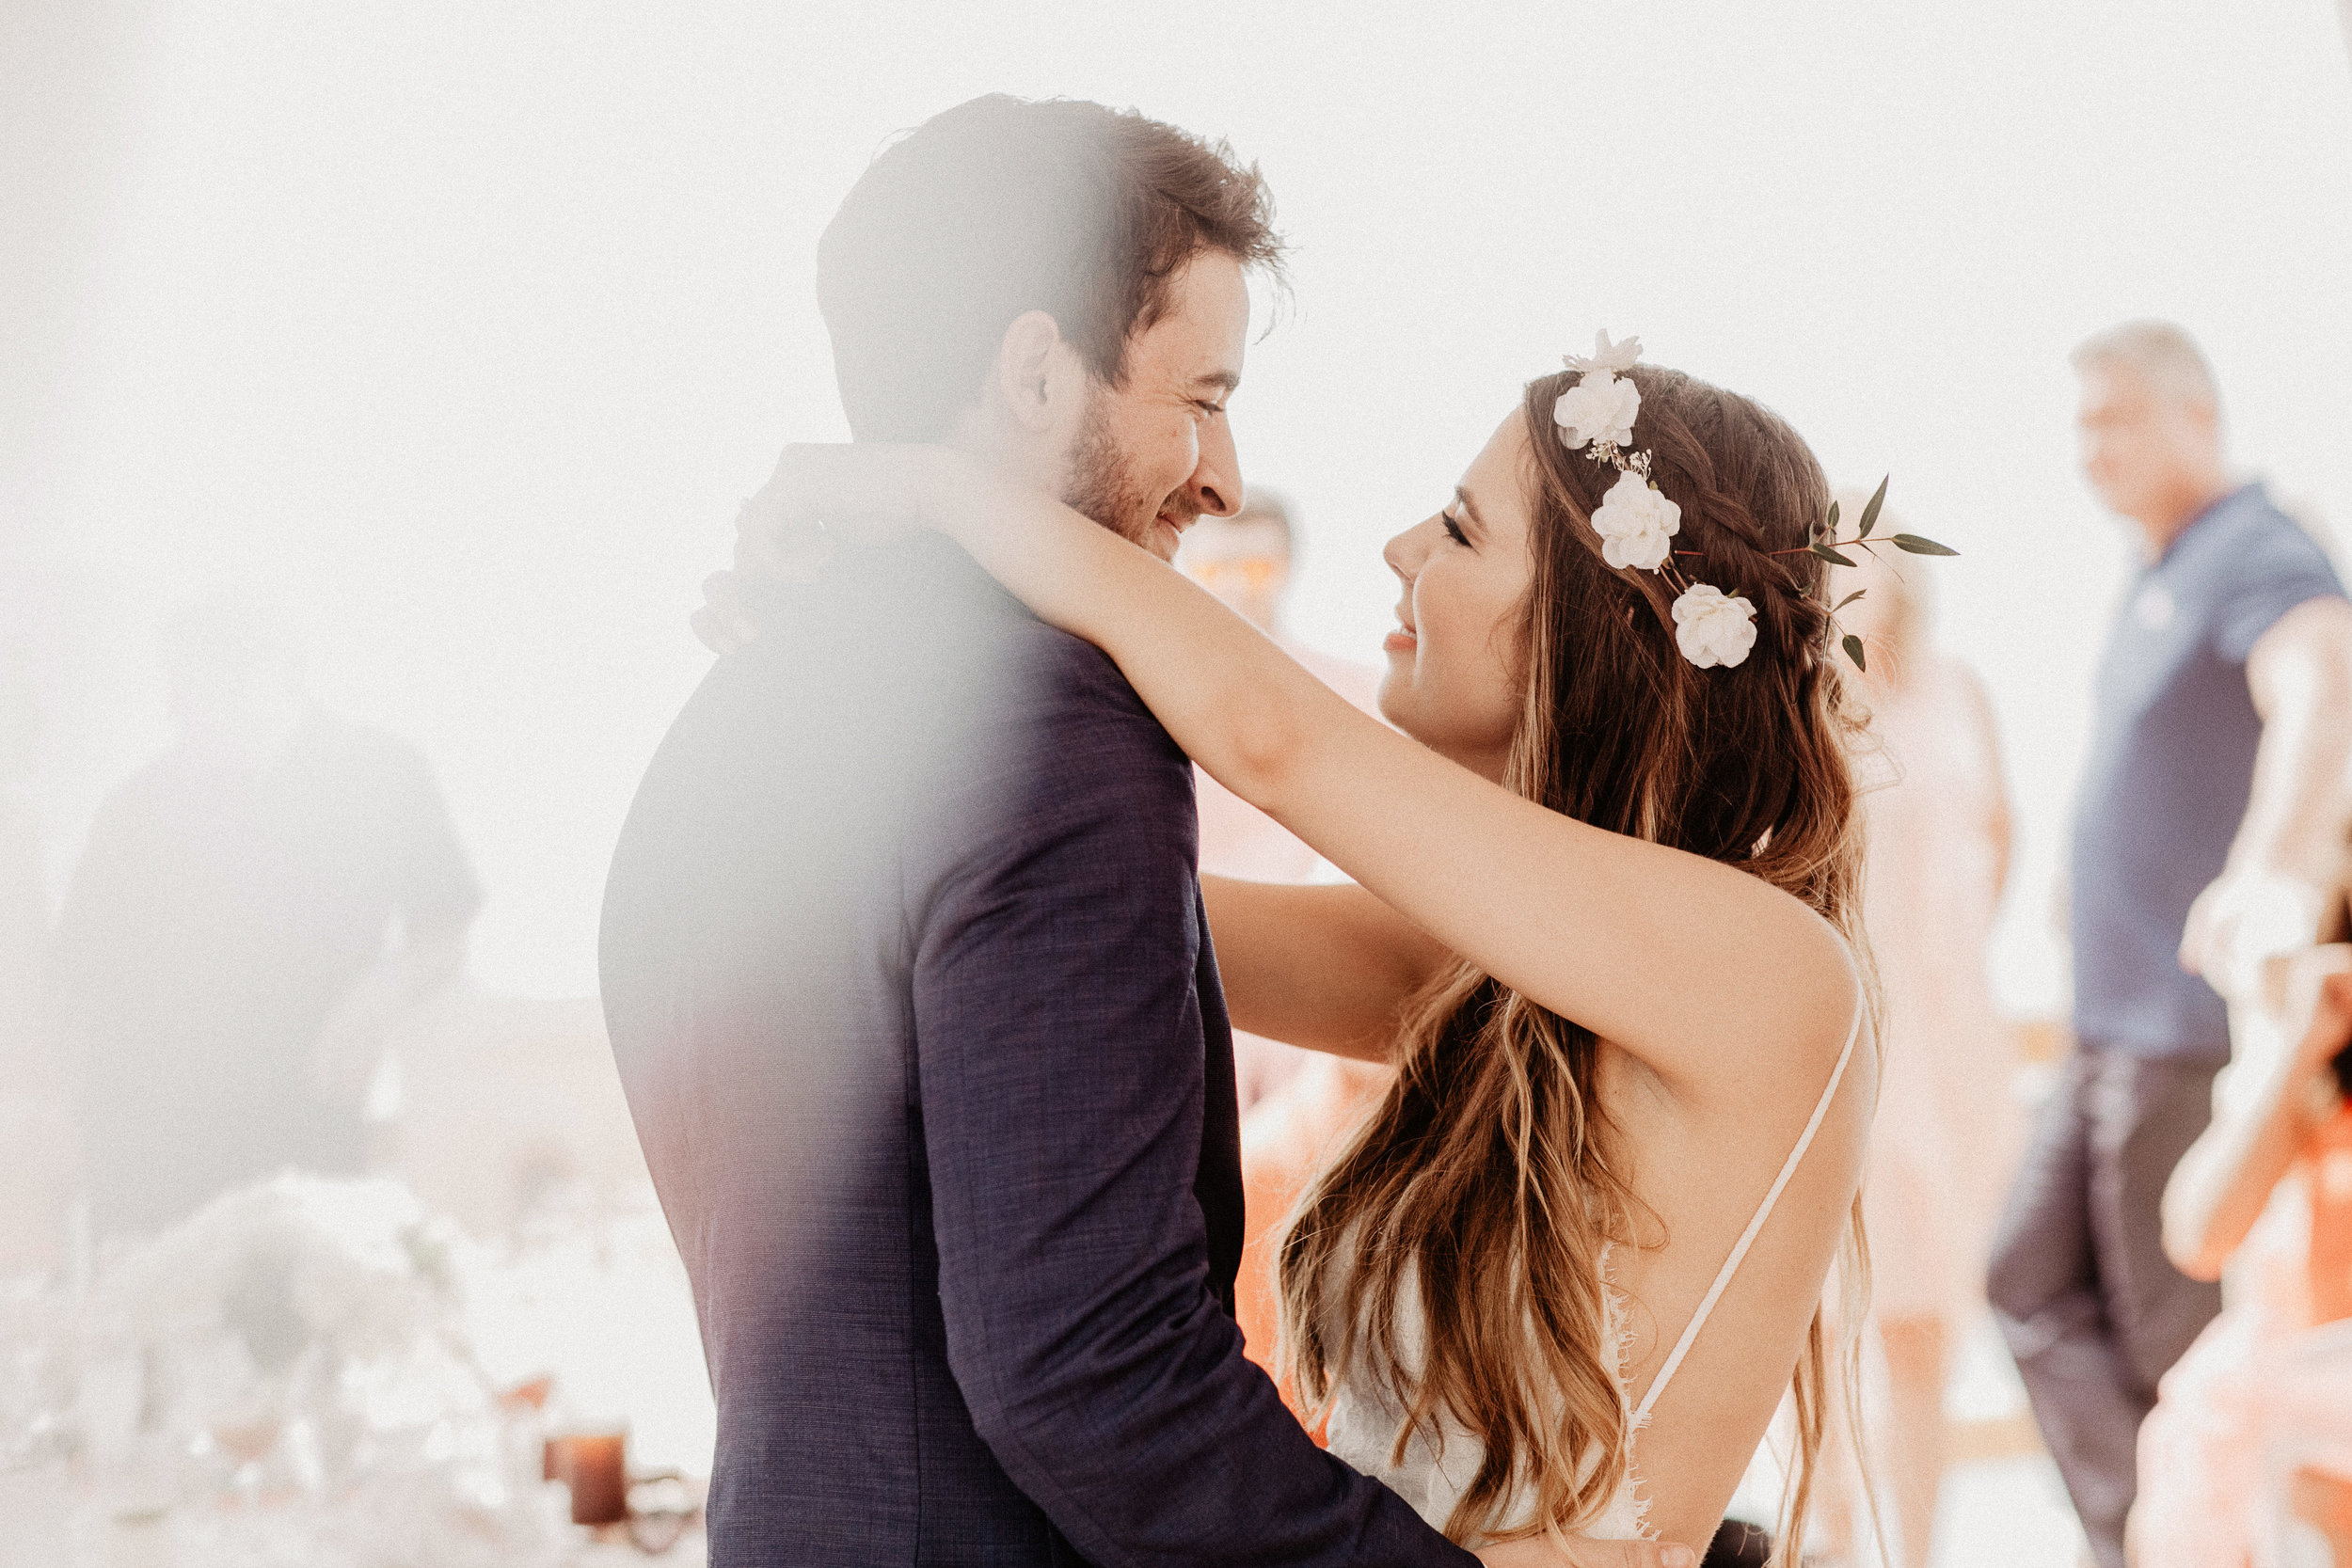 alfonso_flores_destination_wedding_photography_puerto_vallarta_hotel_barcelo_vallarta_cuttler_amela-463.JPG